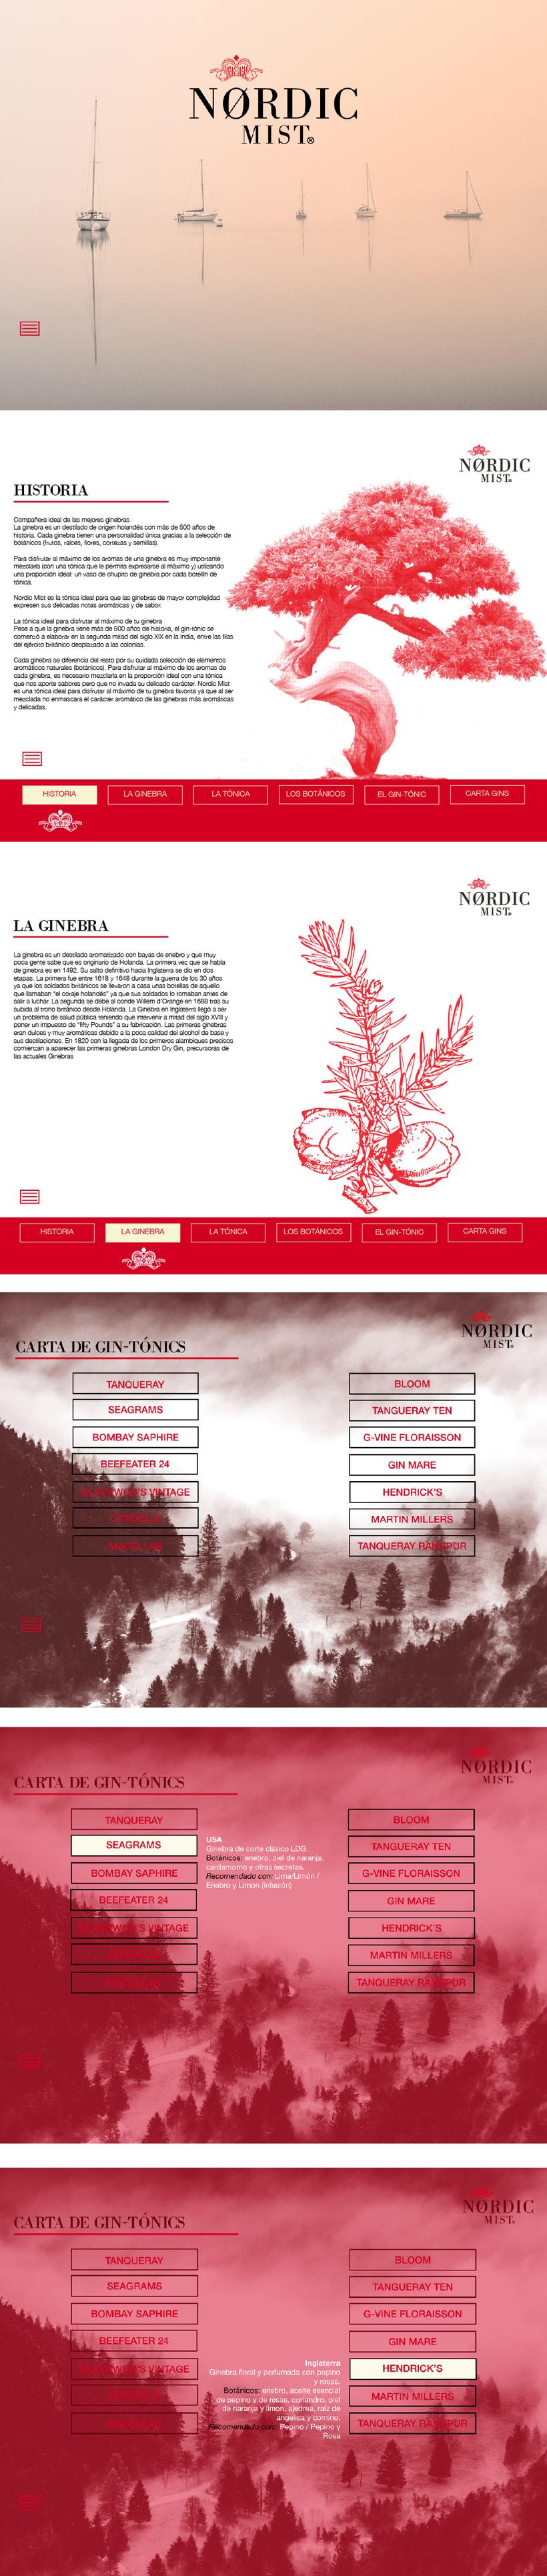 App Promocional Nordic Mist 0